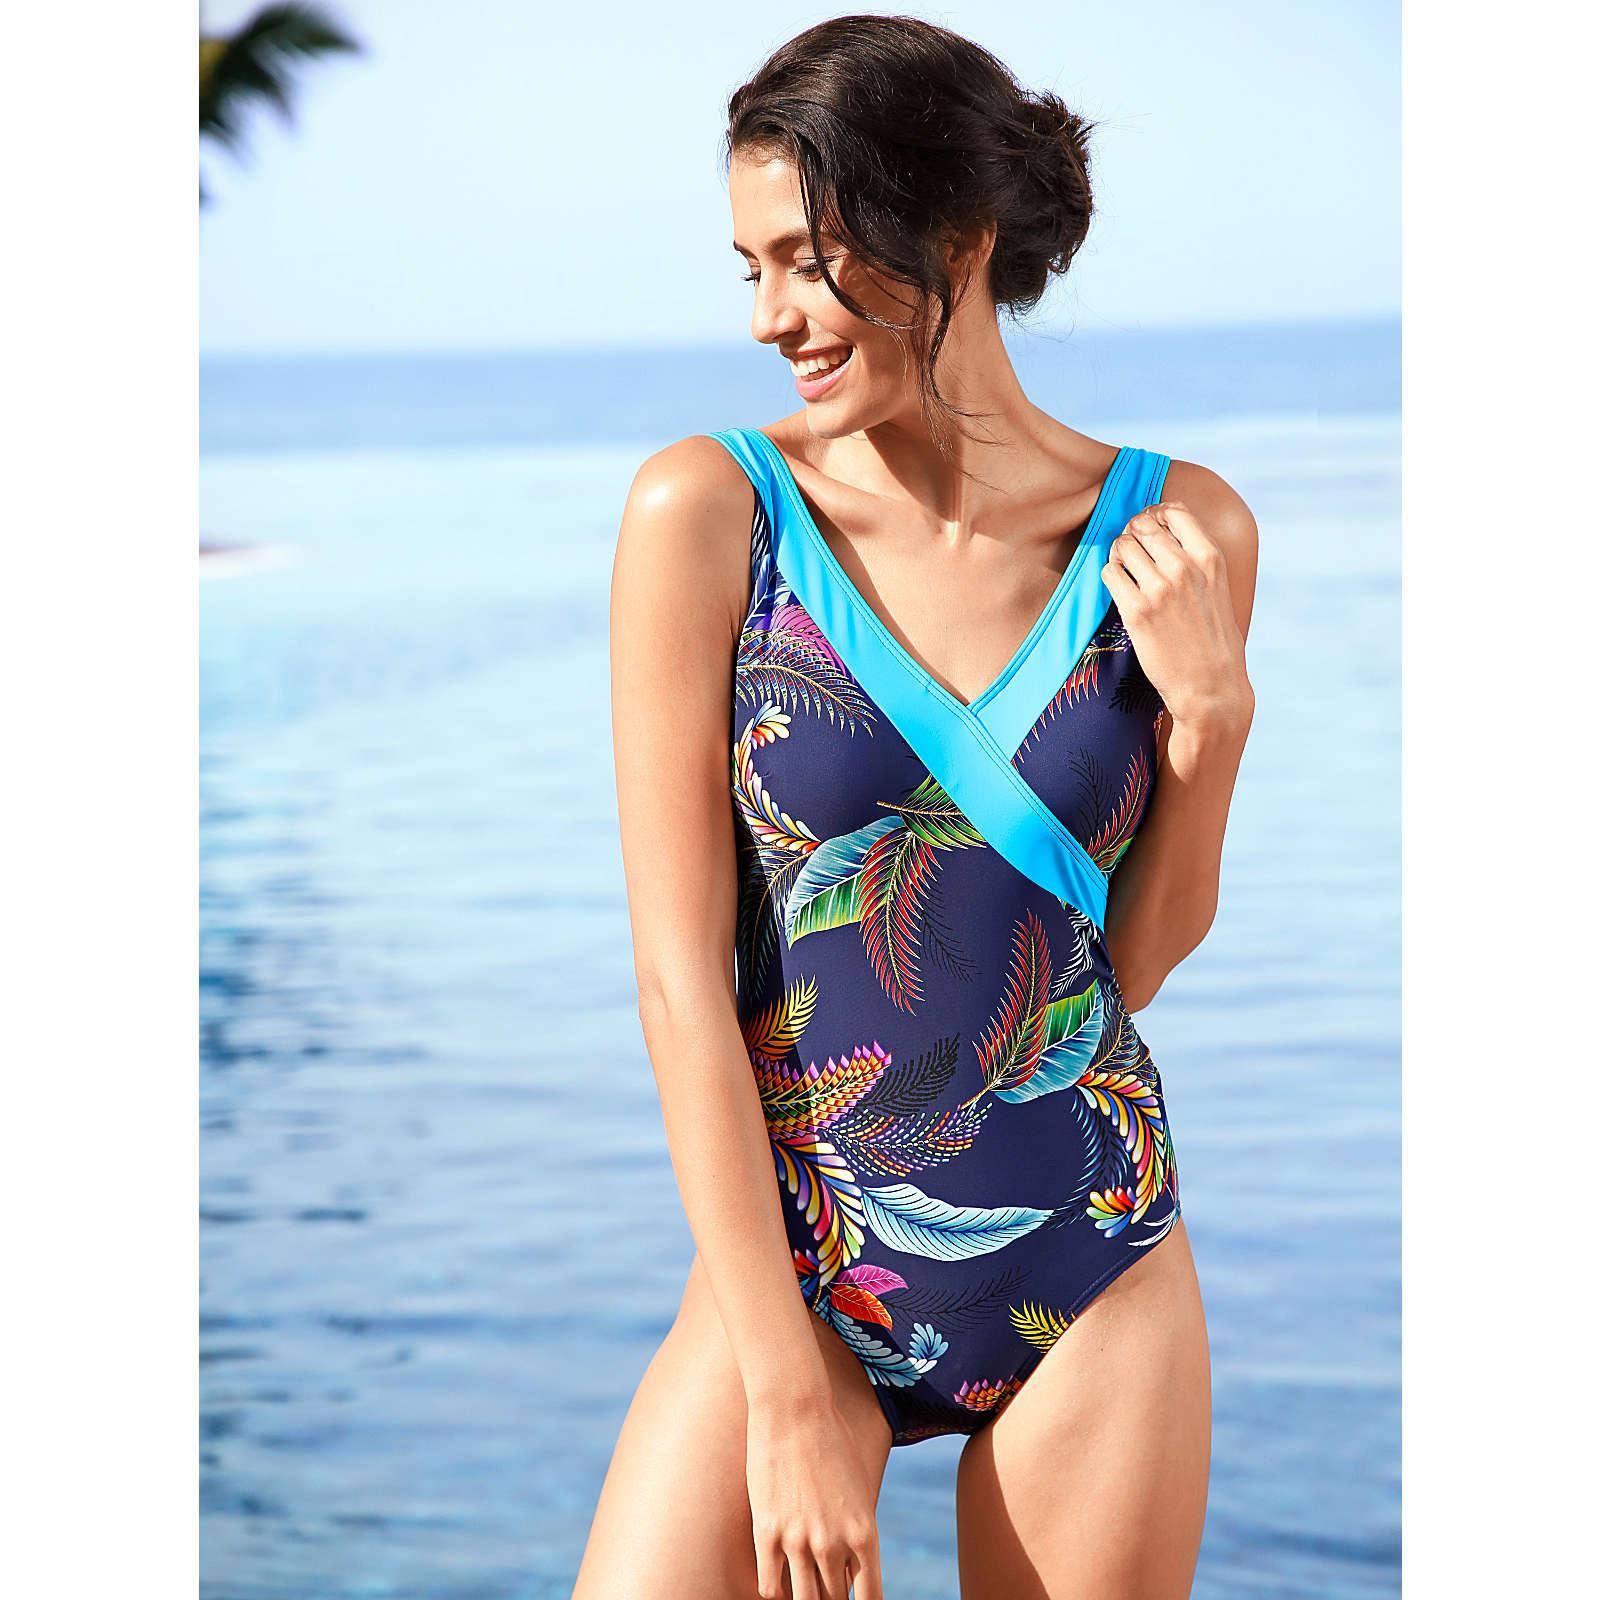 Maritim Badeanzug mehrfarbig Damen Gr. 38